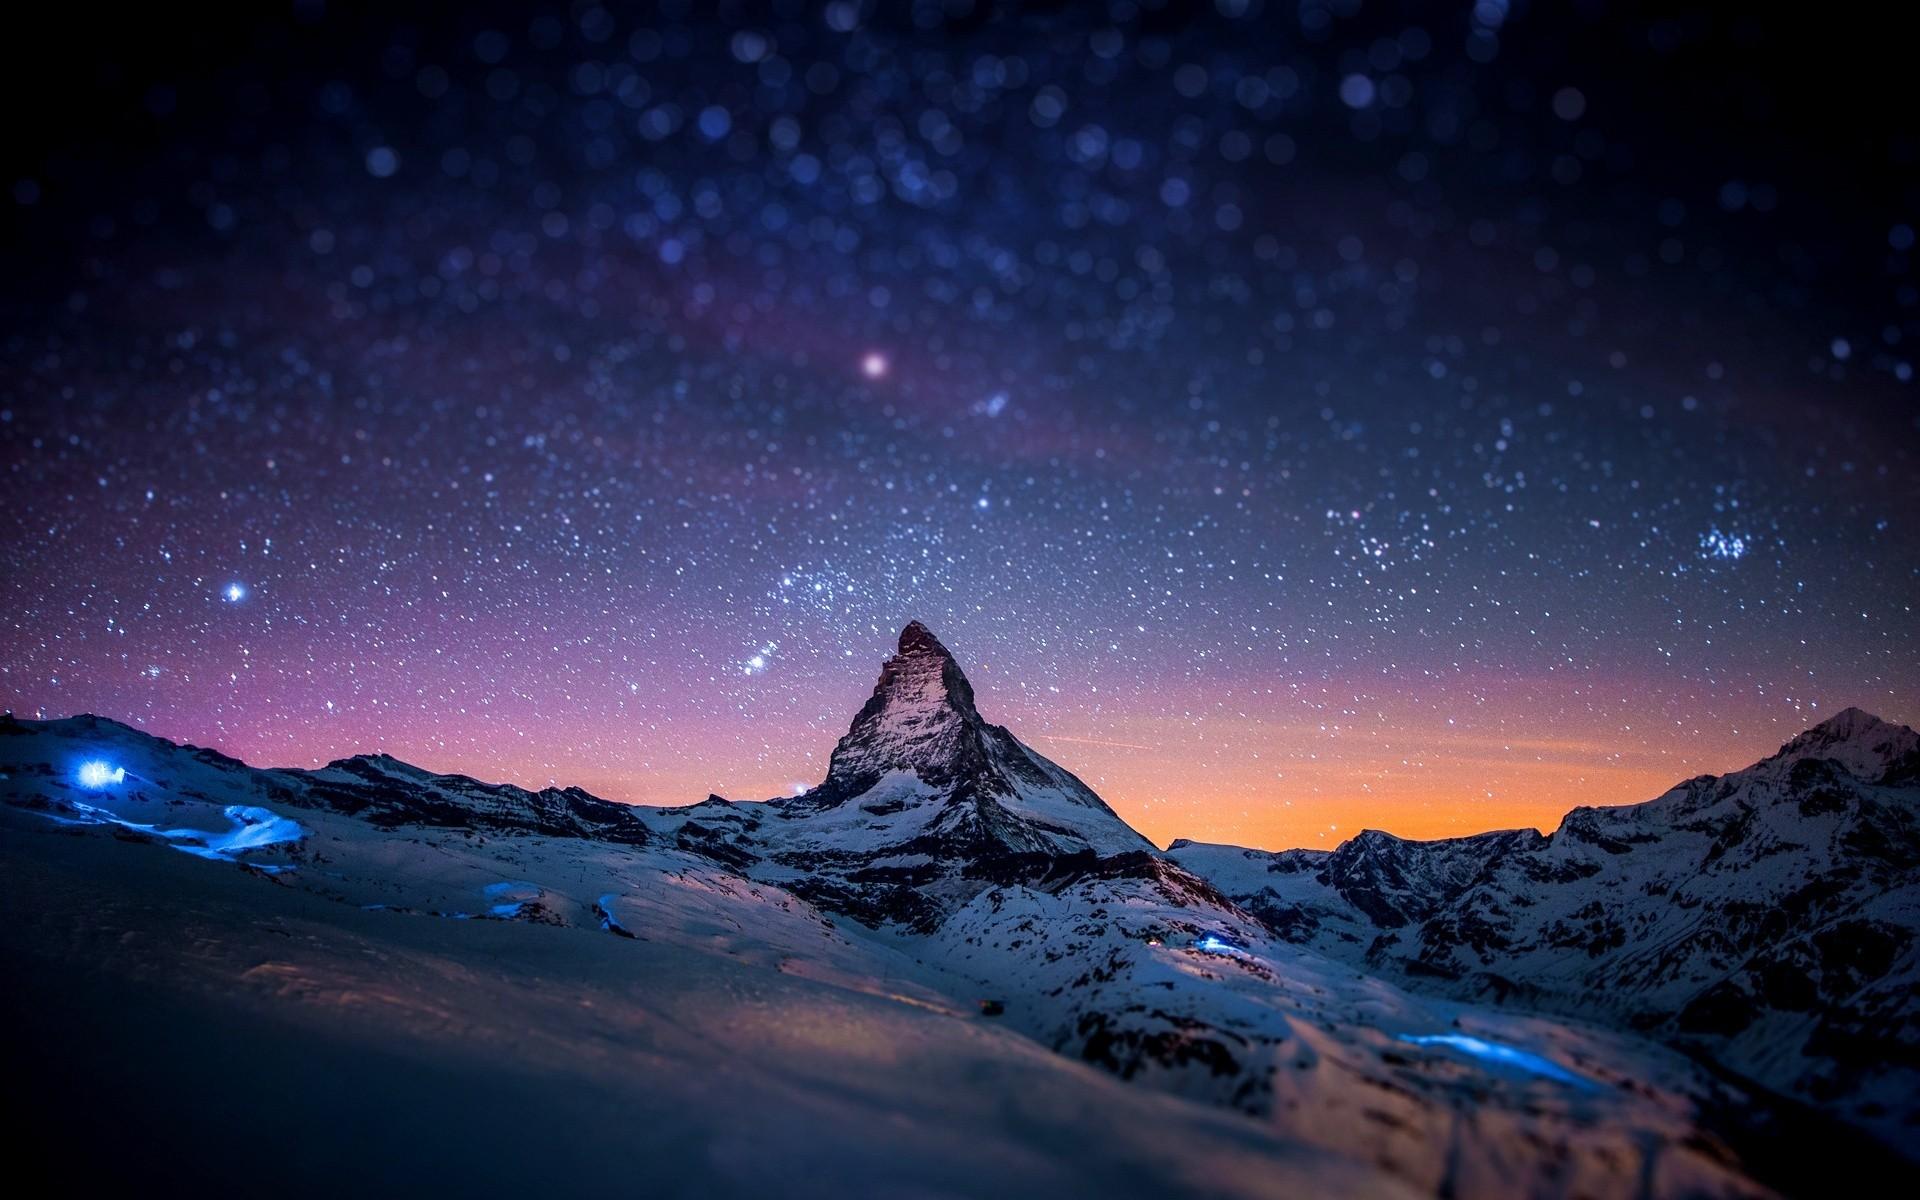 Milky Way Sky Wallpapers | HD Wallpapers